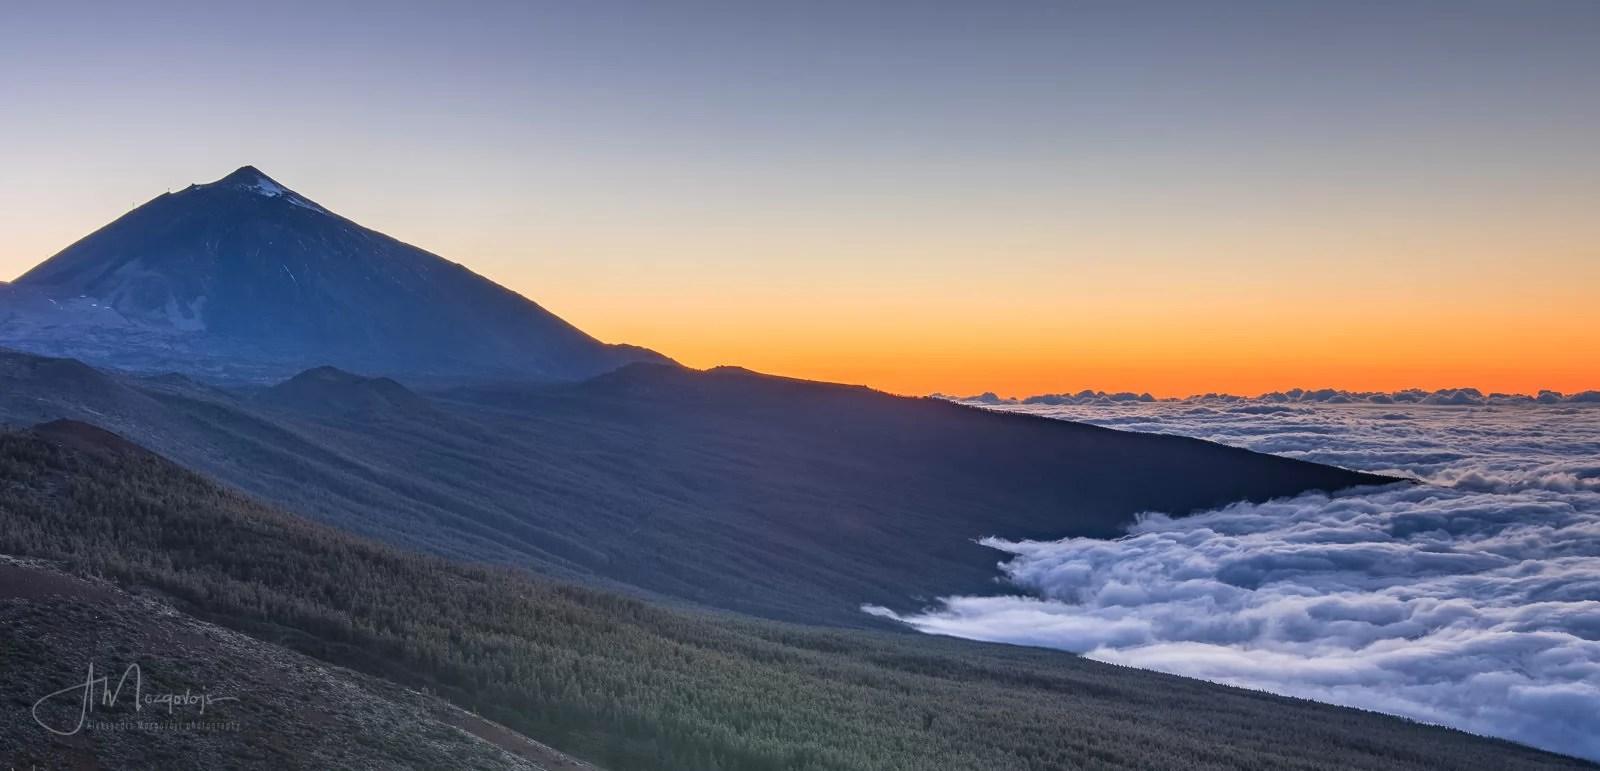 Sunset at Teide